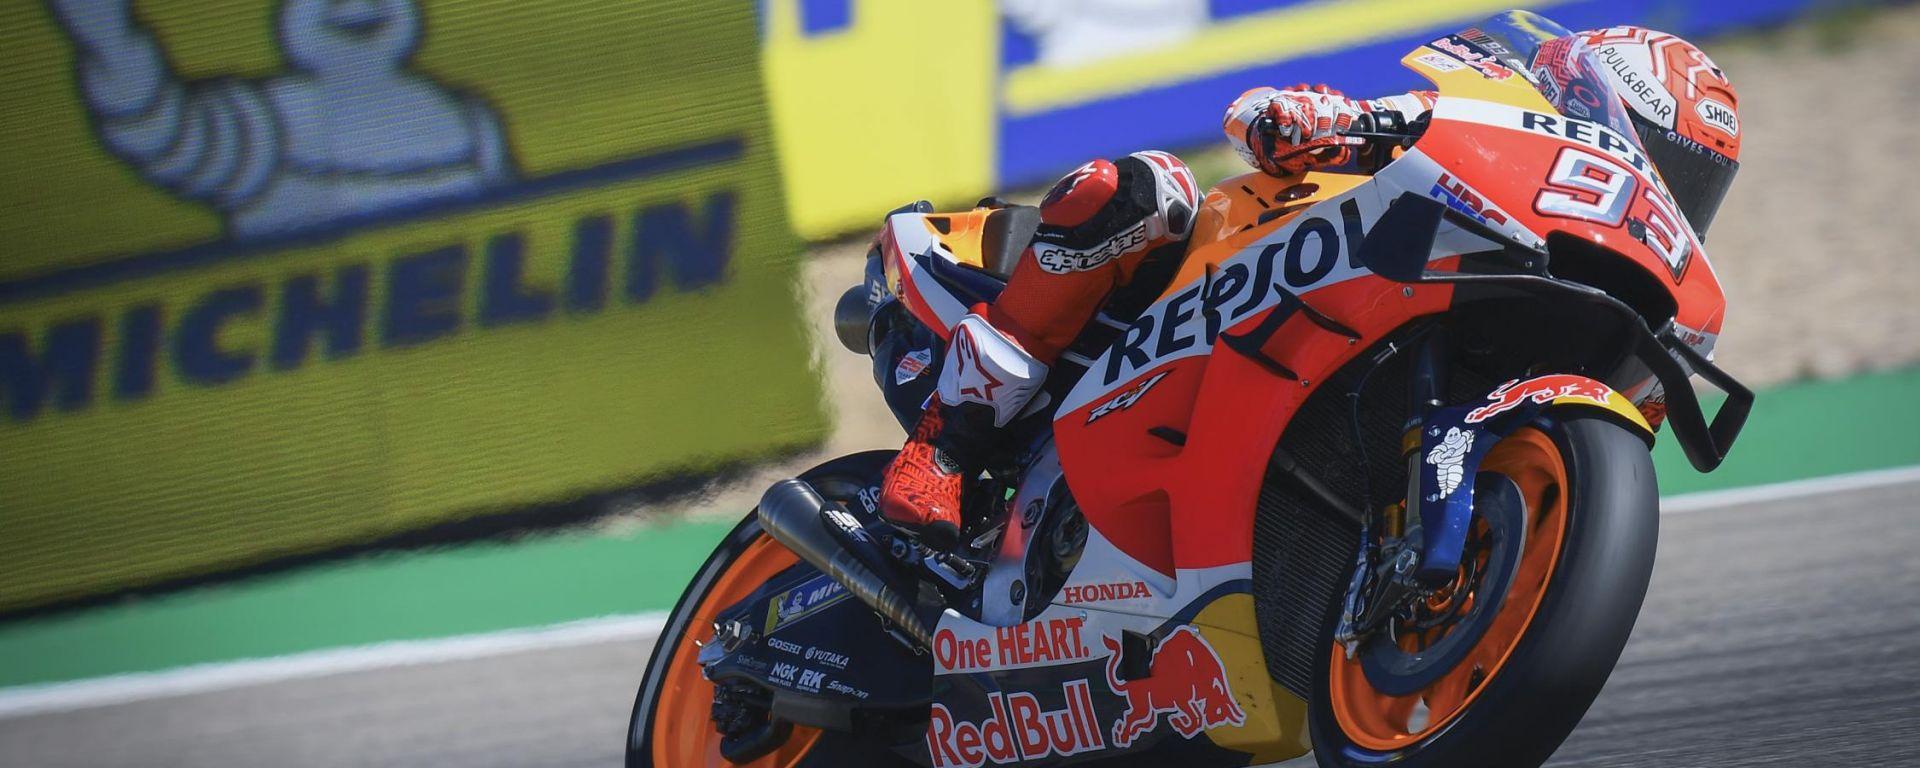 MotoGP Aragona 2019, Alcaniz, Marc Marquez (Honda)